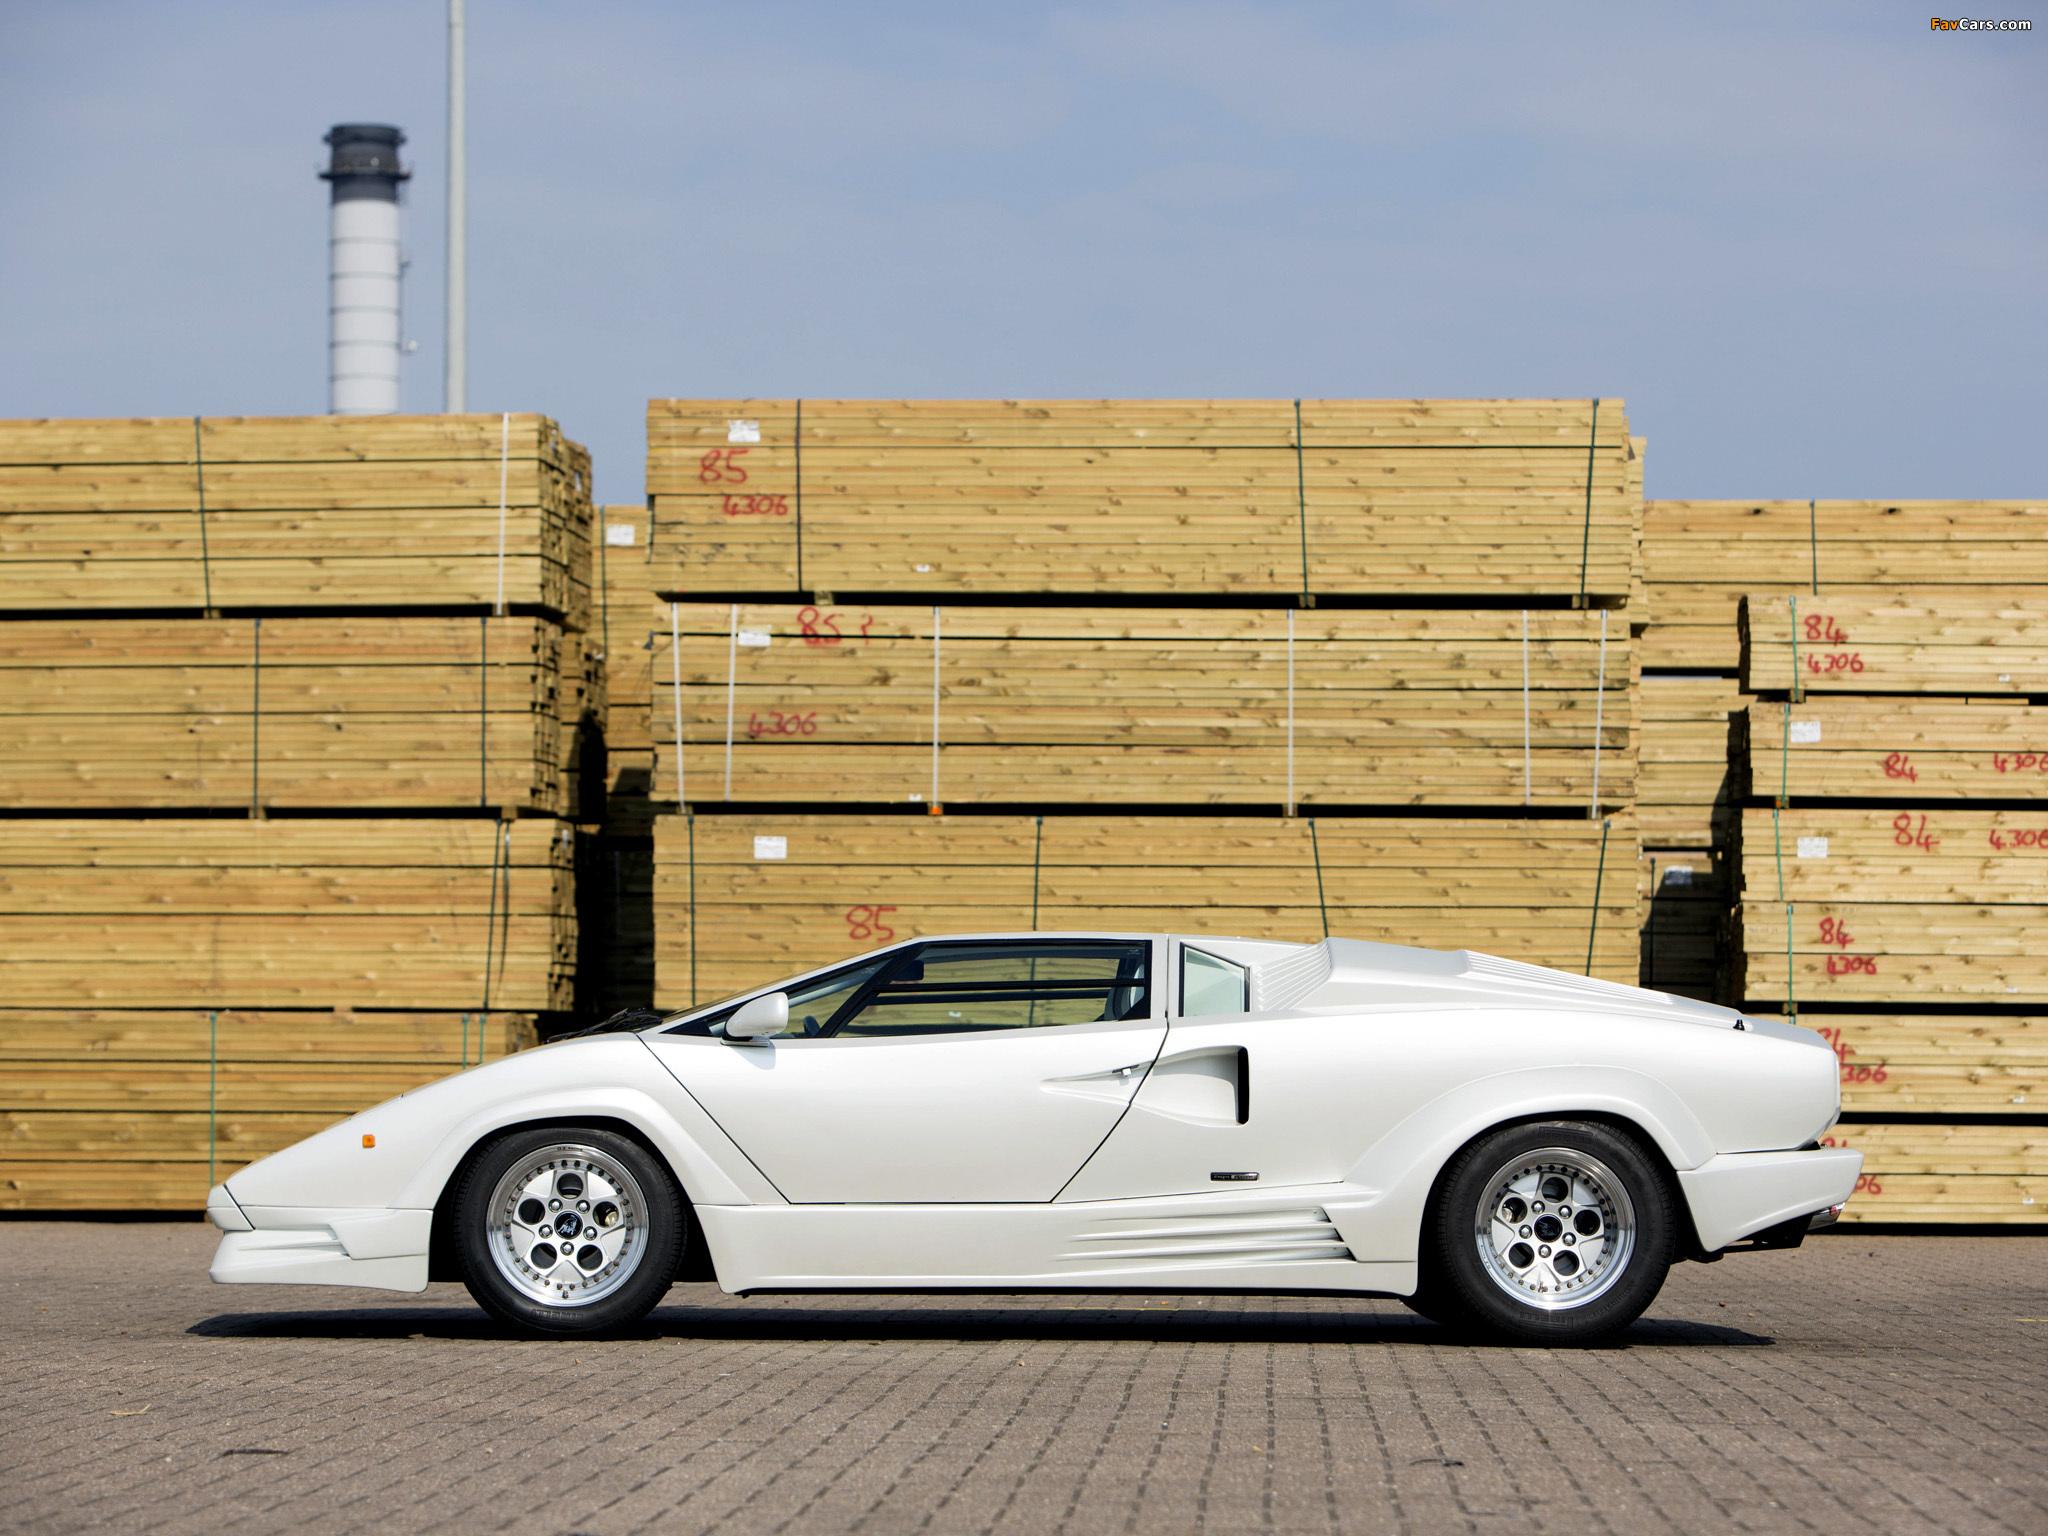 lamborghini_countach_1988_images_5 Elegant Lamborghini Countach 25th Anniversary Specs Cars Trend